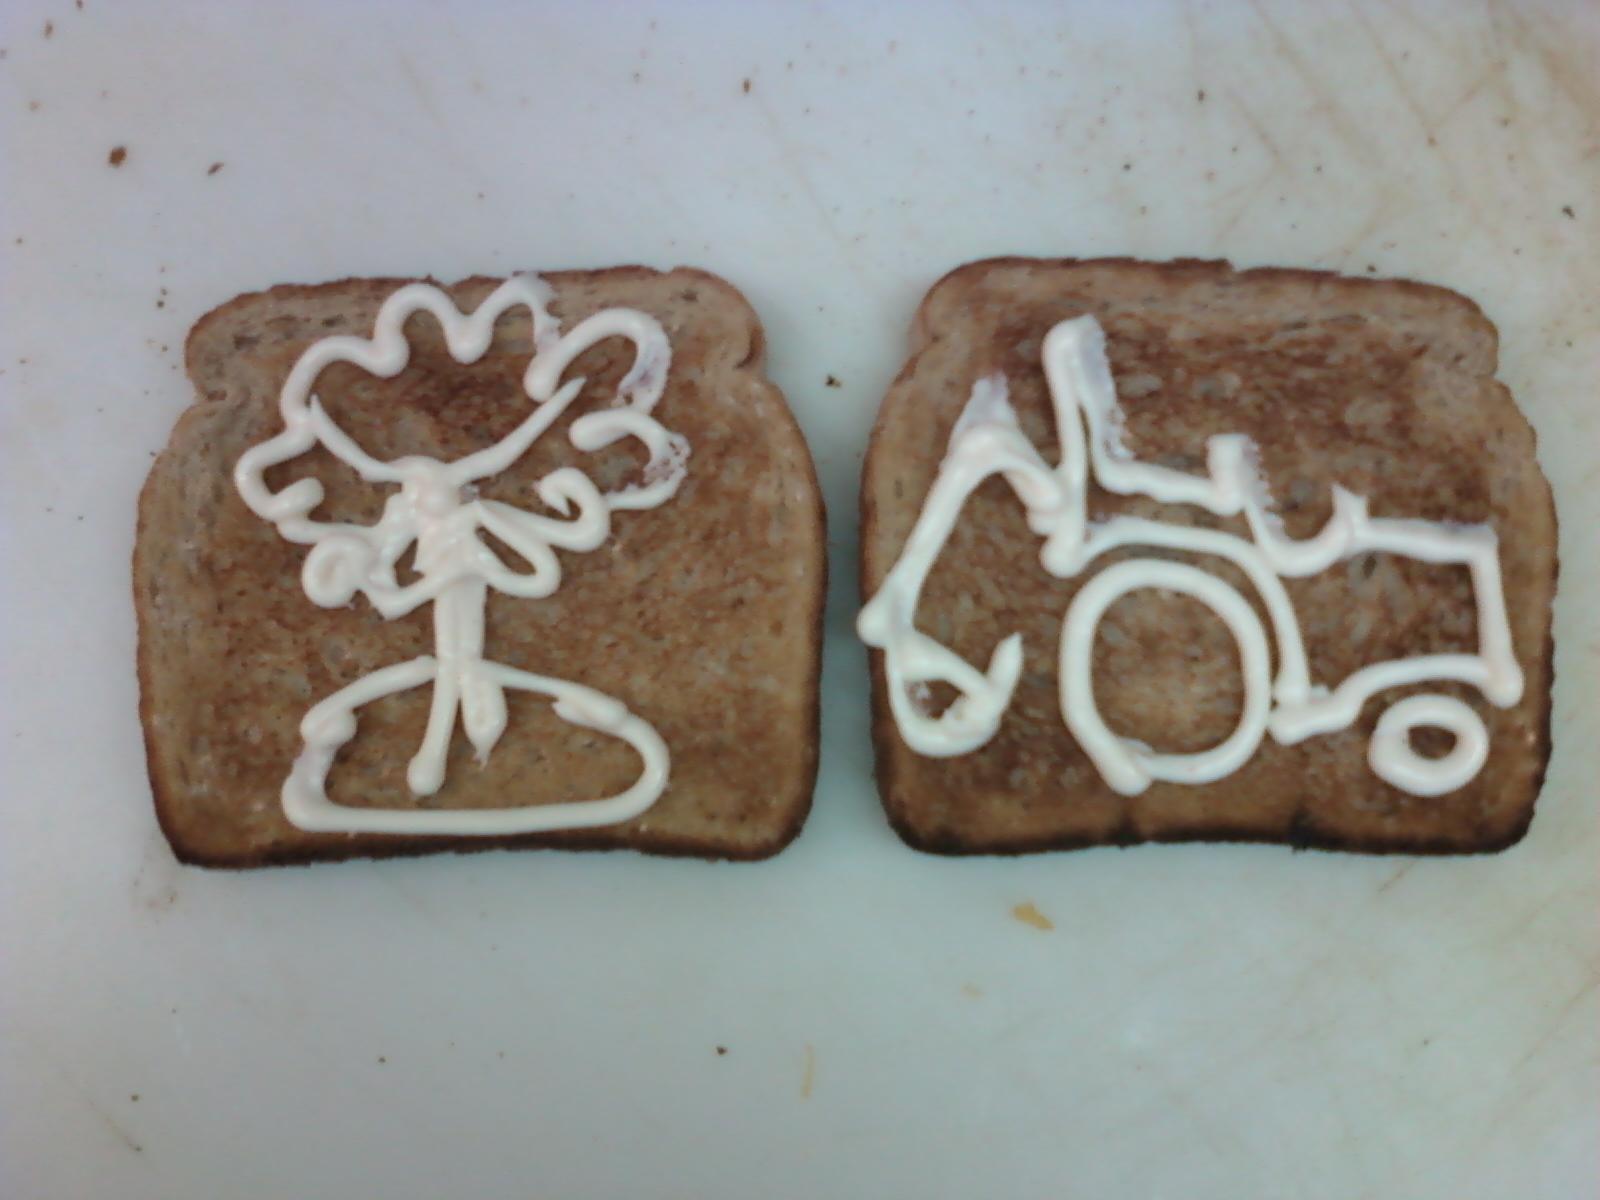 sandwich_art/0929111044.jpg